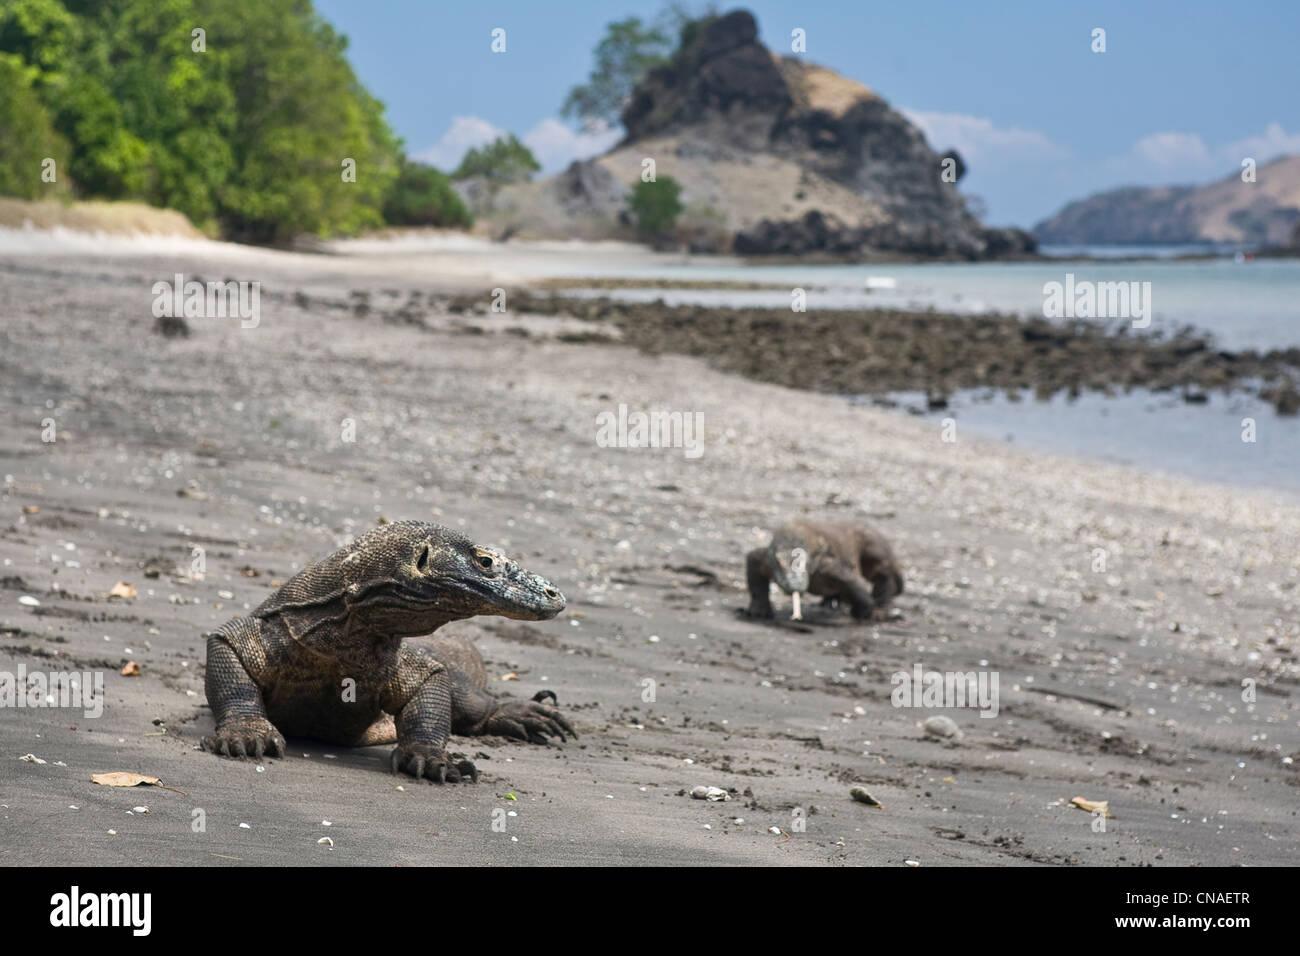 A pair of Komodo dragons, Varanus komodoensis, wander the shoreline on Rinca Island. Cannibal Rock is in the background. - Stock Image